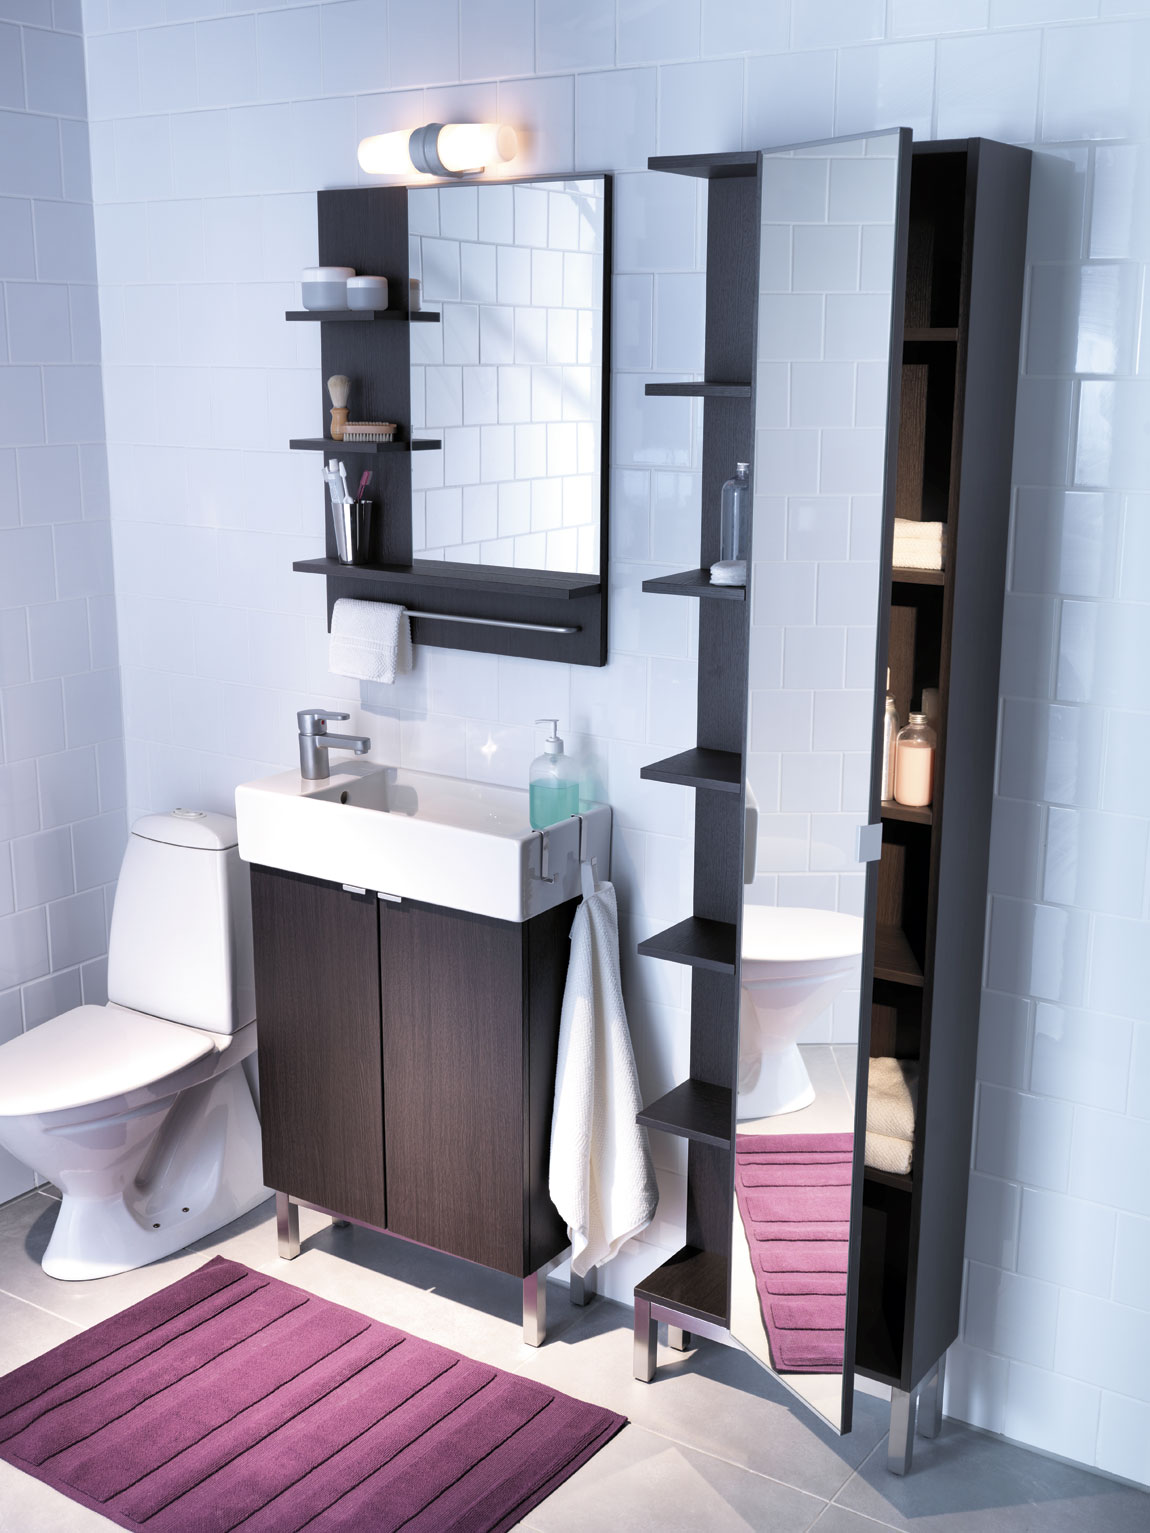 Ikea banos 1 for Muebles para bano ikea